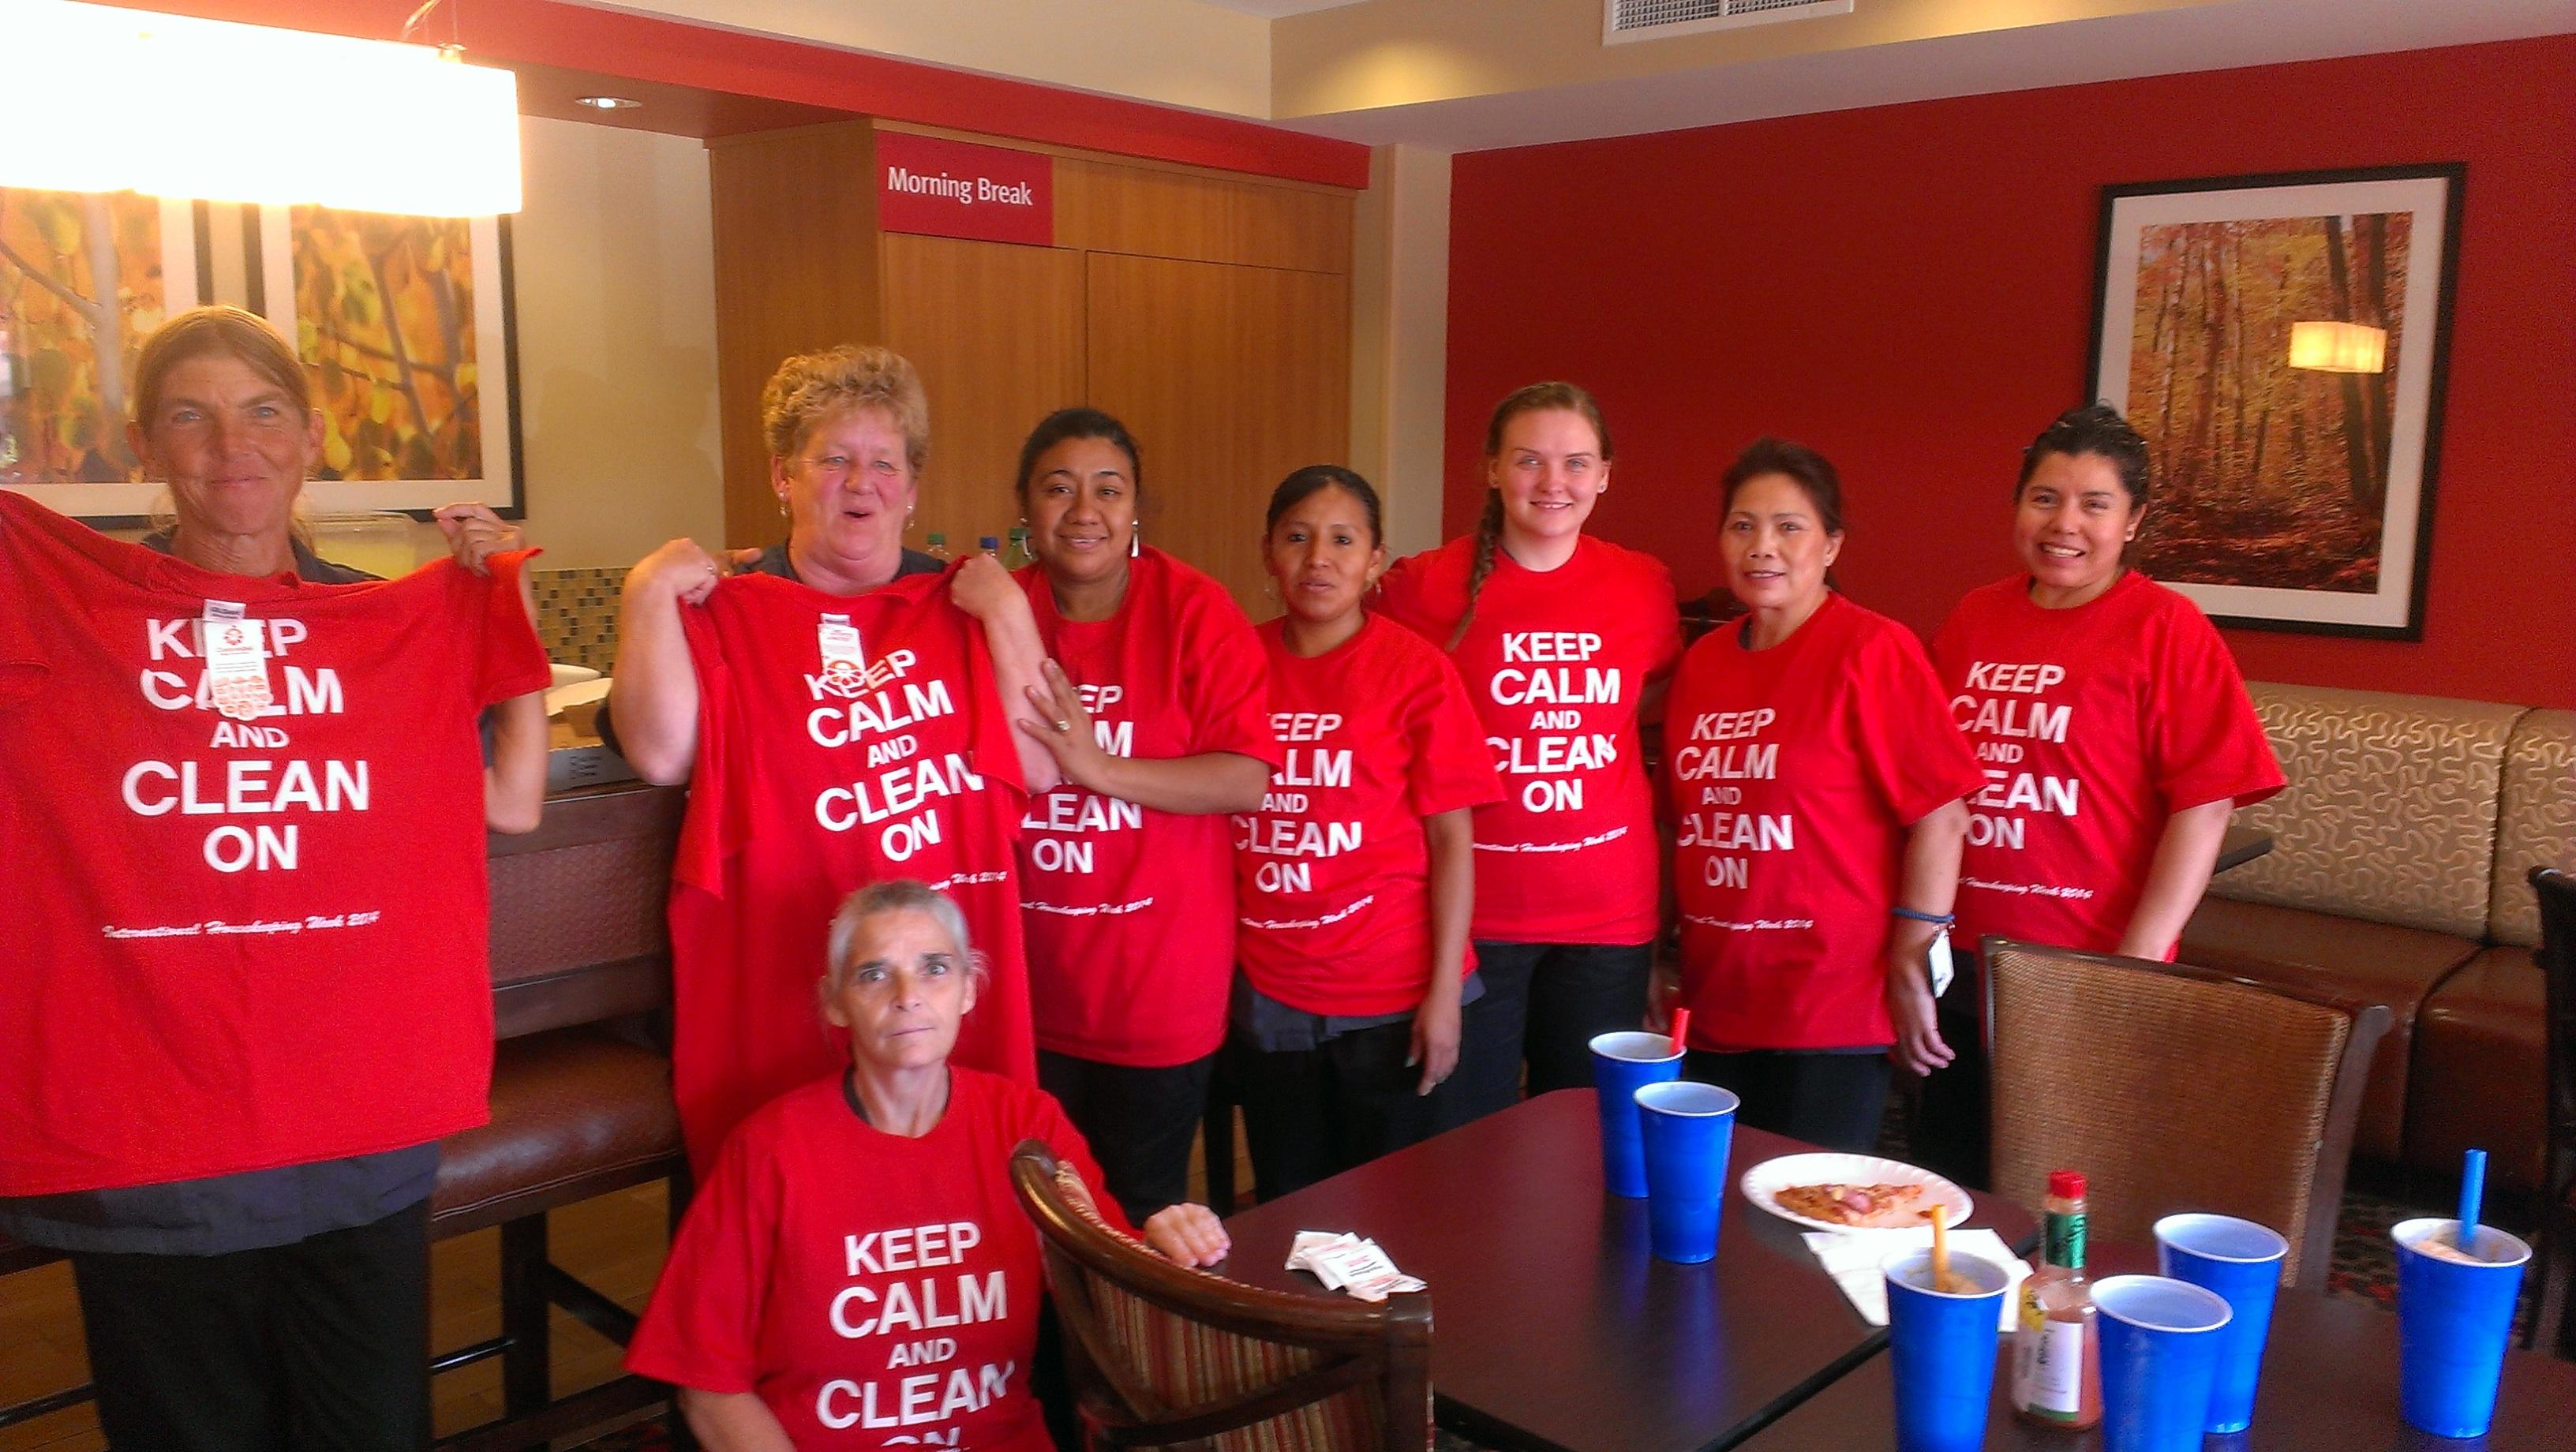 Design your own t-shirt keep calm - Housekeeping Week T Shirt Photo